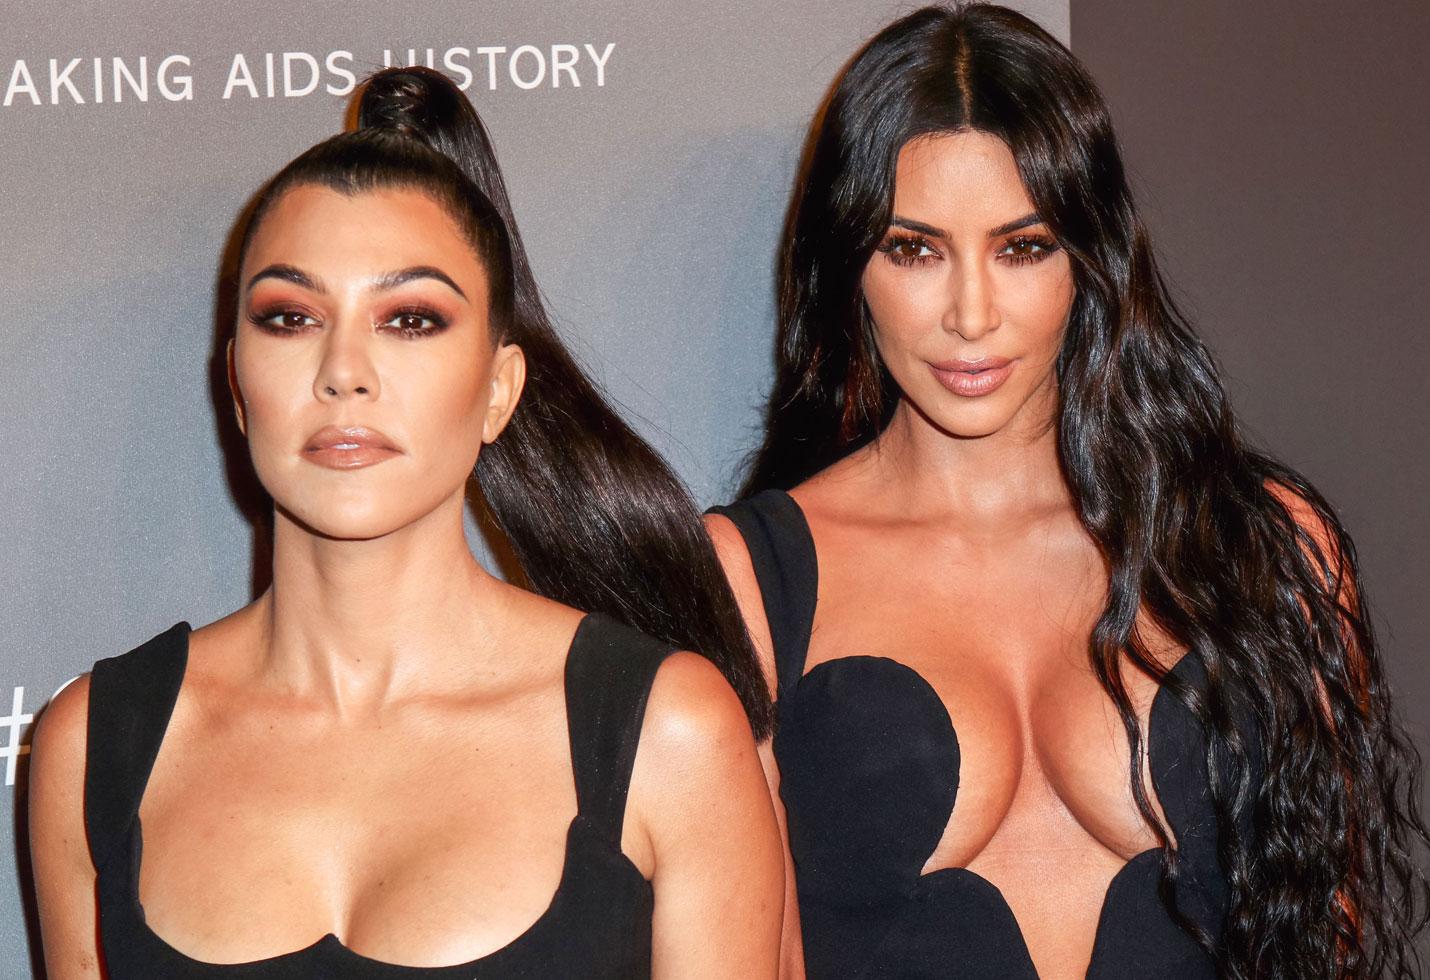 Kim kourtney kardashian matching dresses cleavage photos